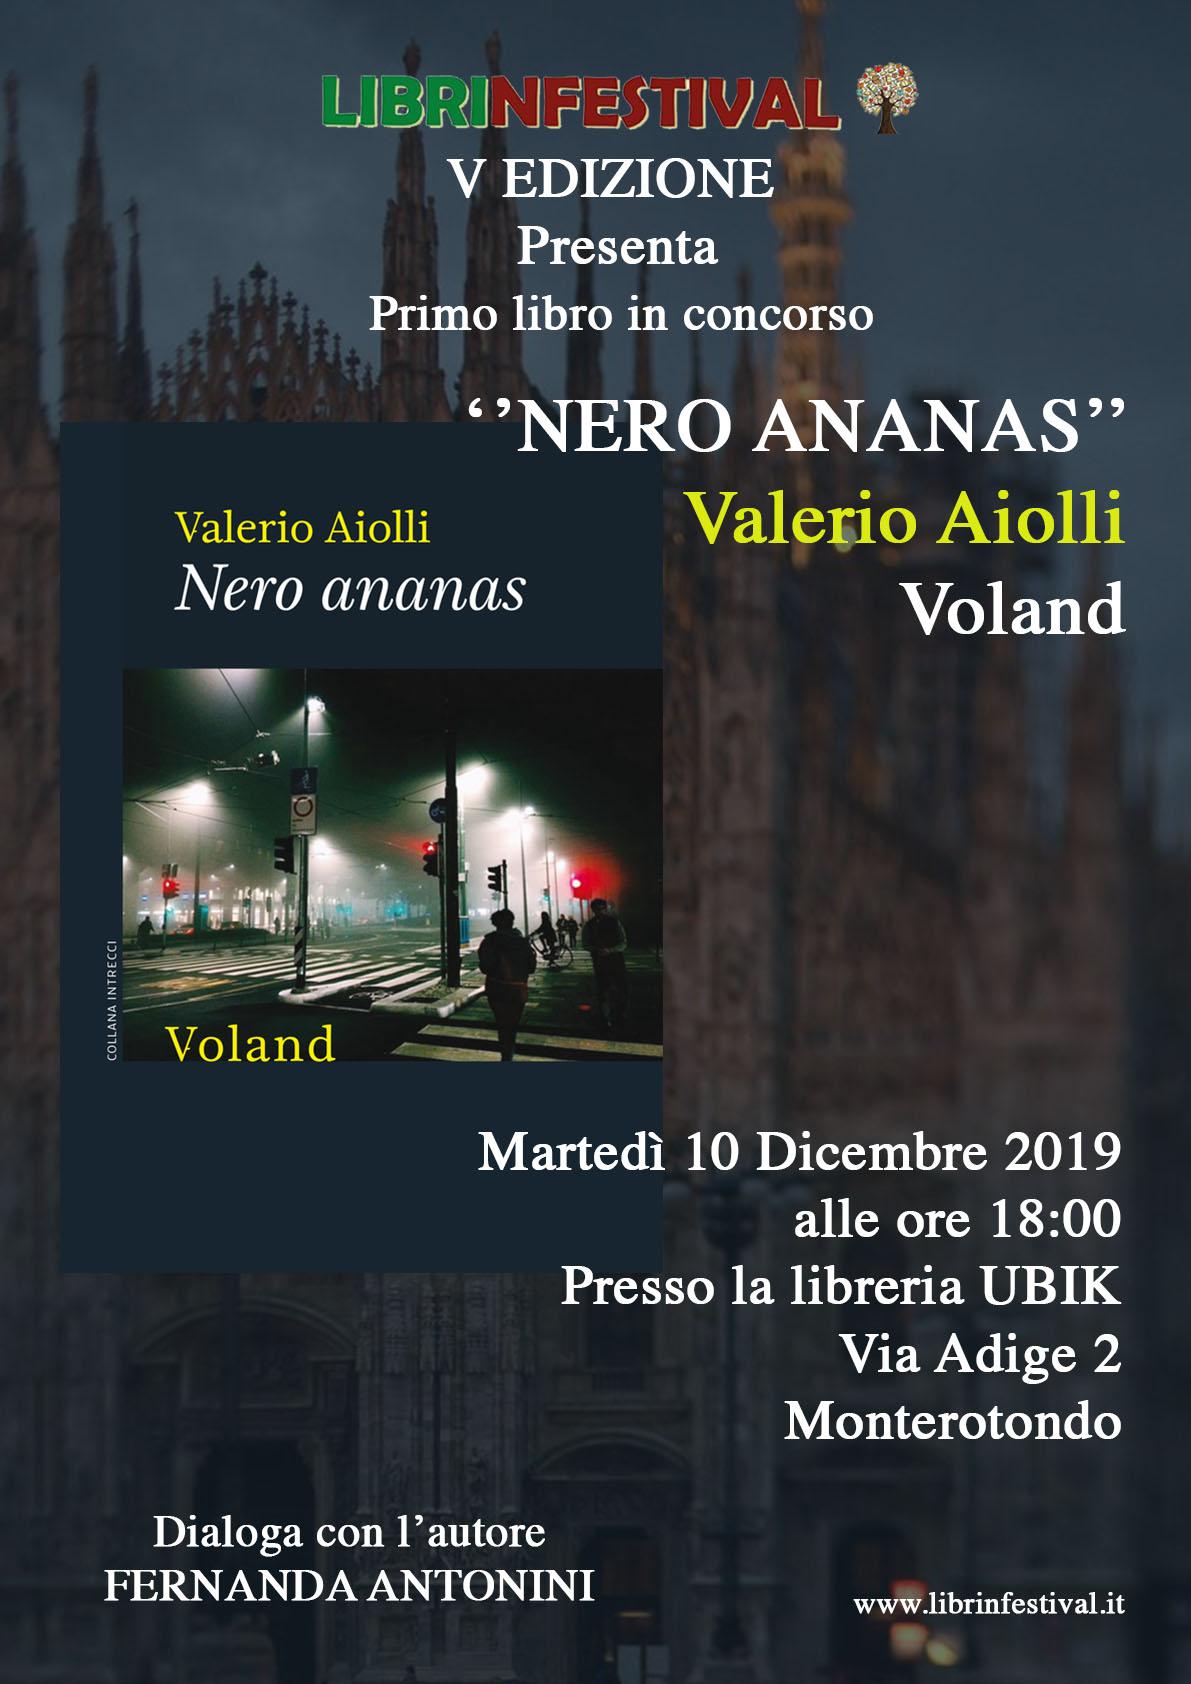 Nero ananas, Valerio Aiolli, Voland, #Librinfestrival